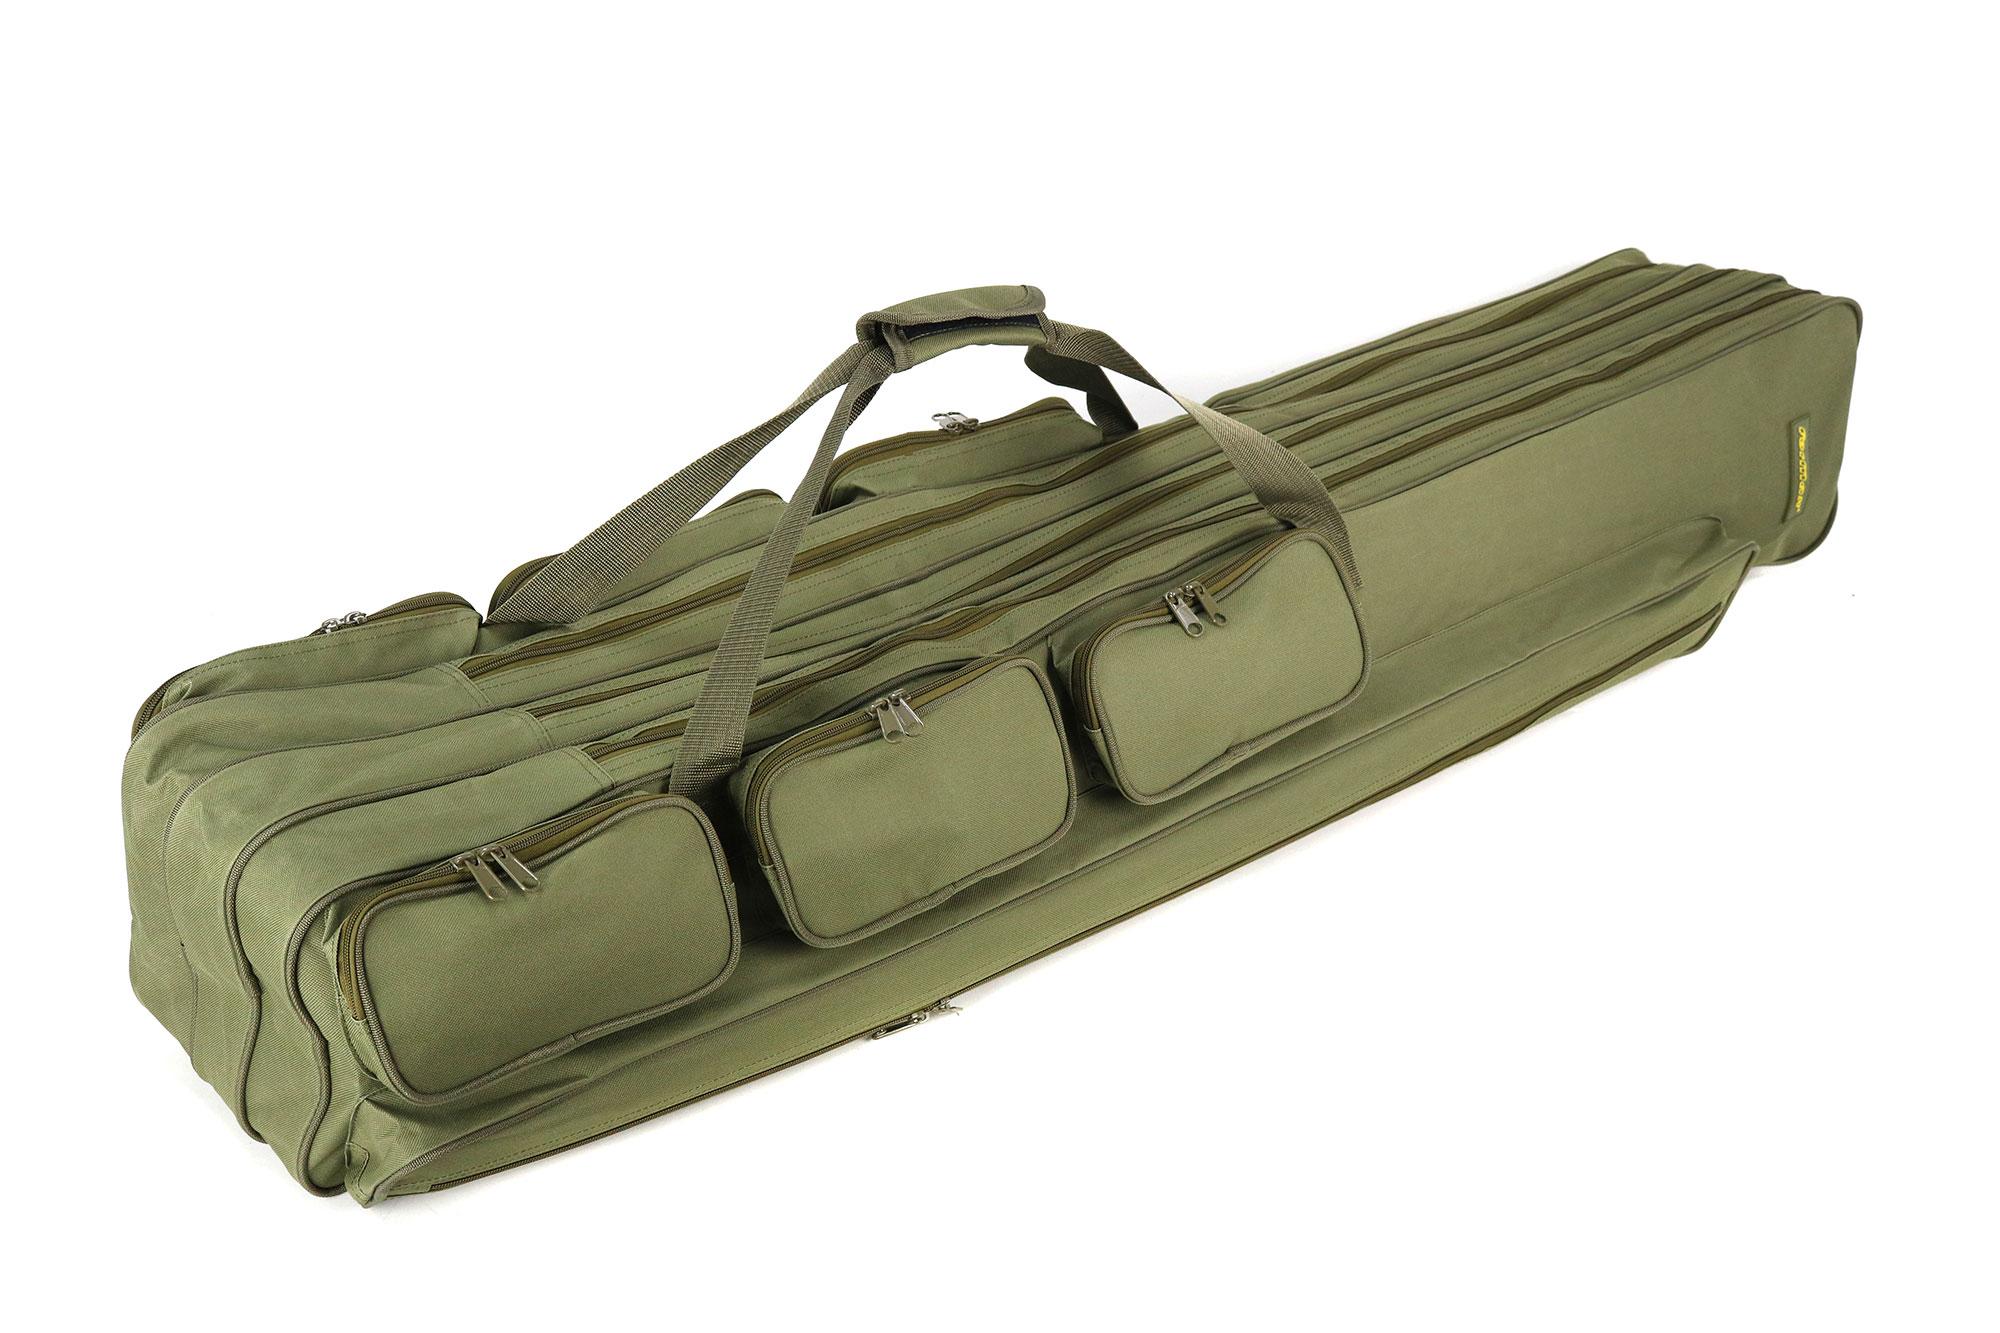 STANDARD 3 ROD BAG 100-160CM (1)